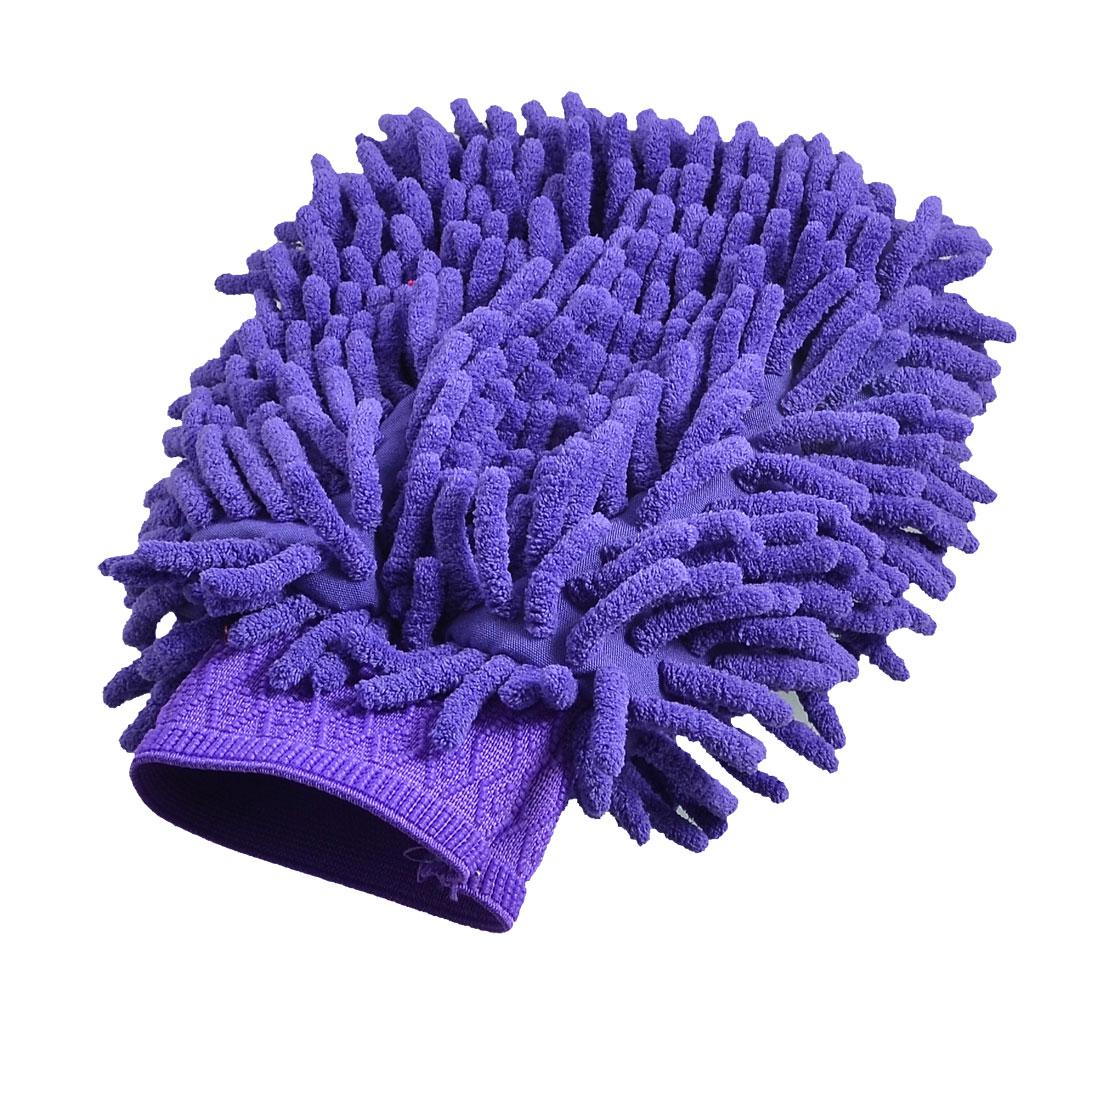 Car 23cm x 15cm Purple Dual Sides Microfiber Chenille Wash Mitten Glove